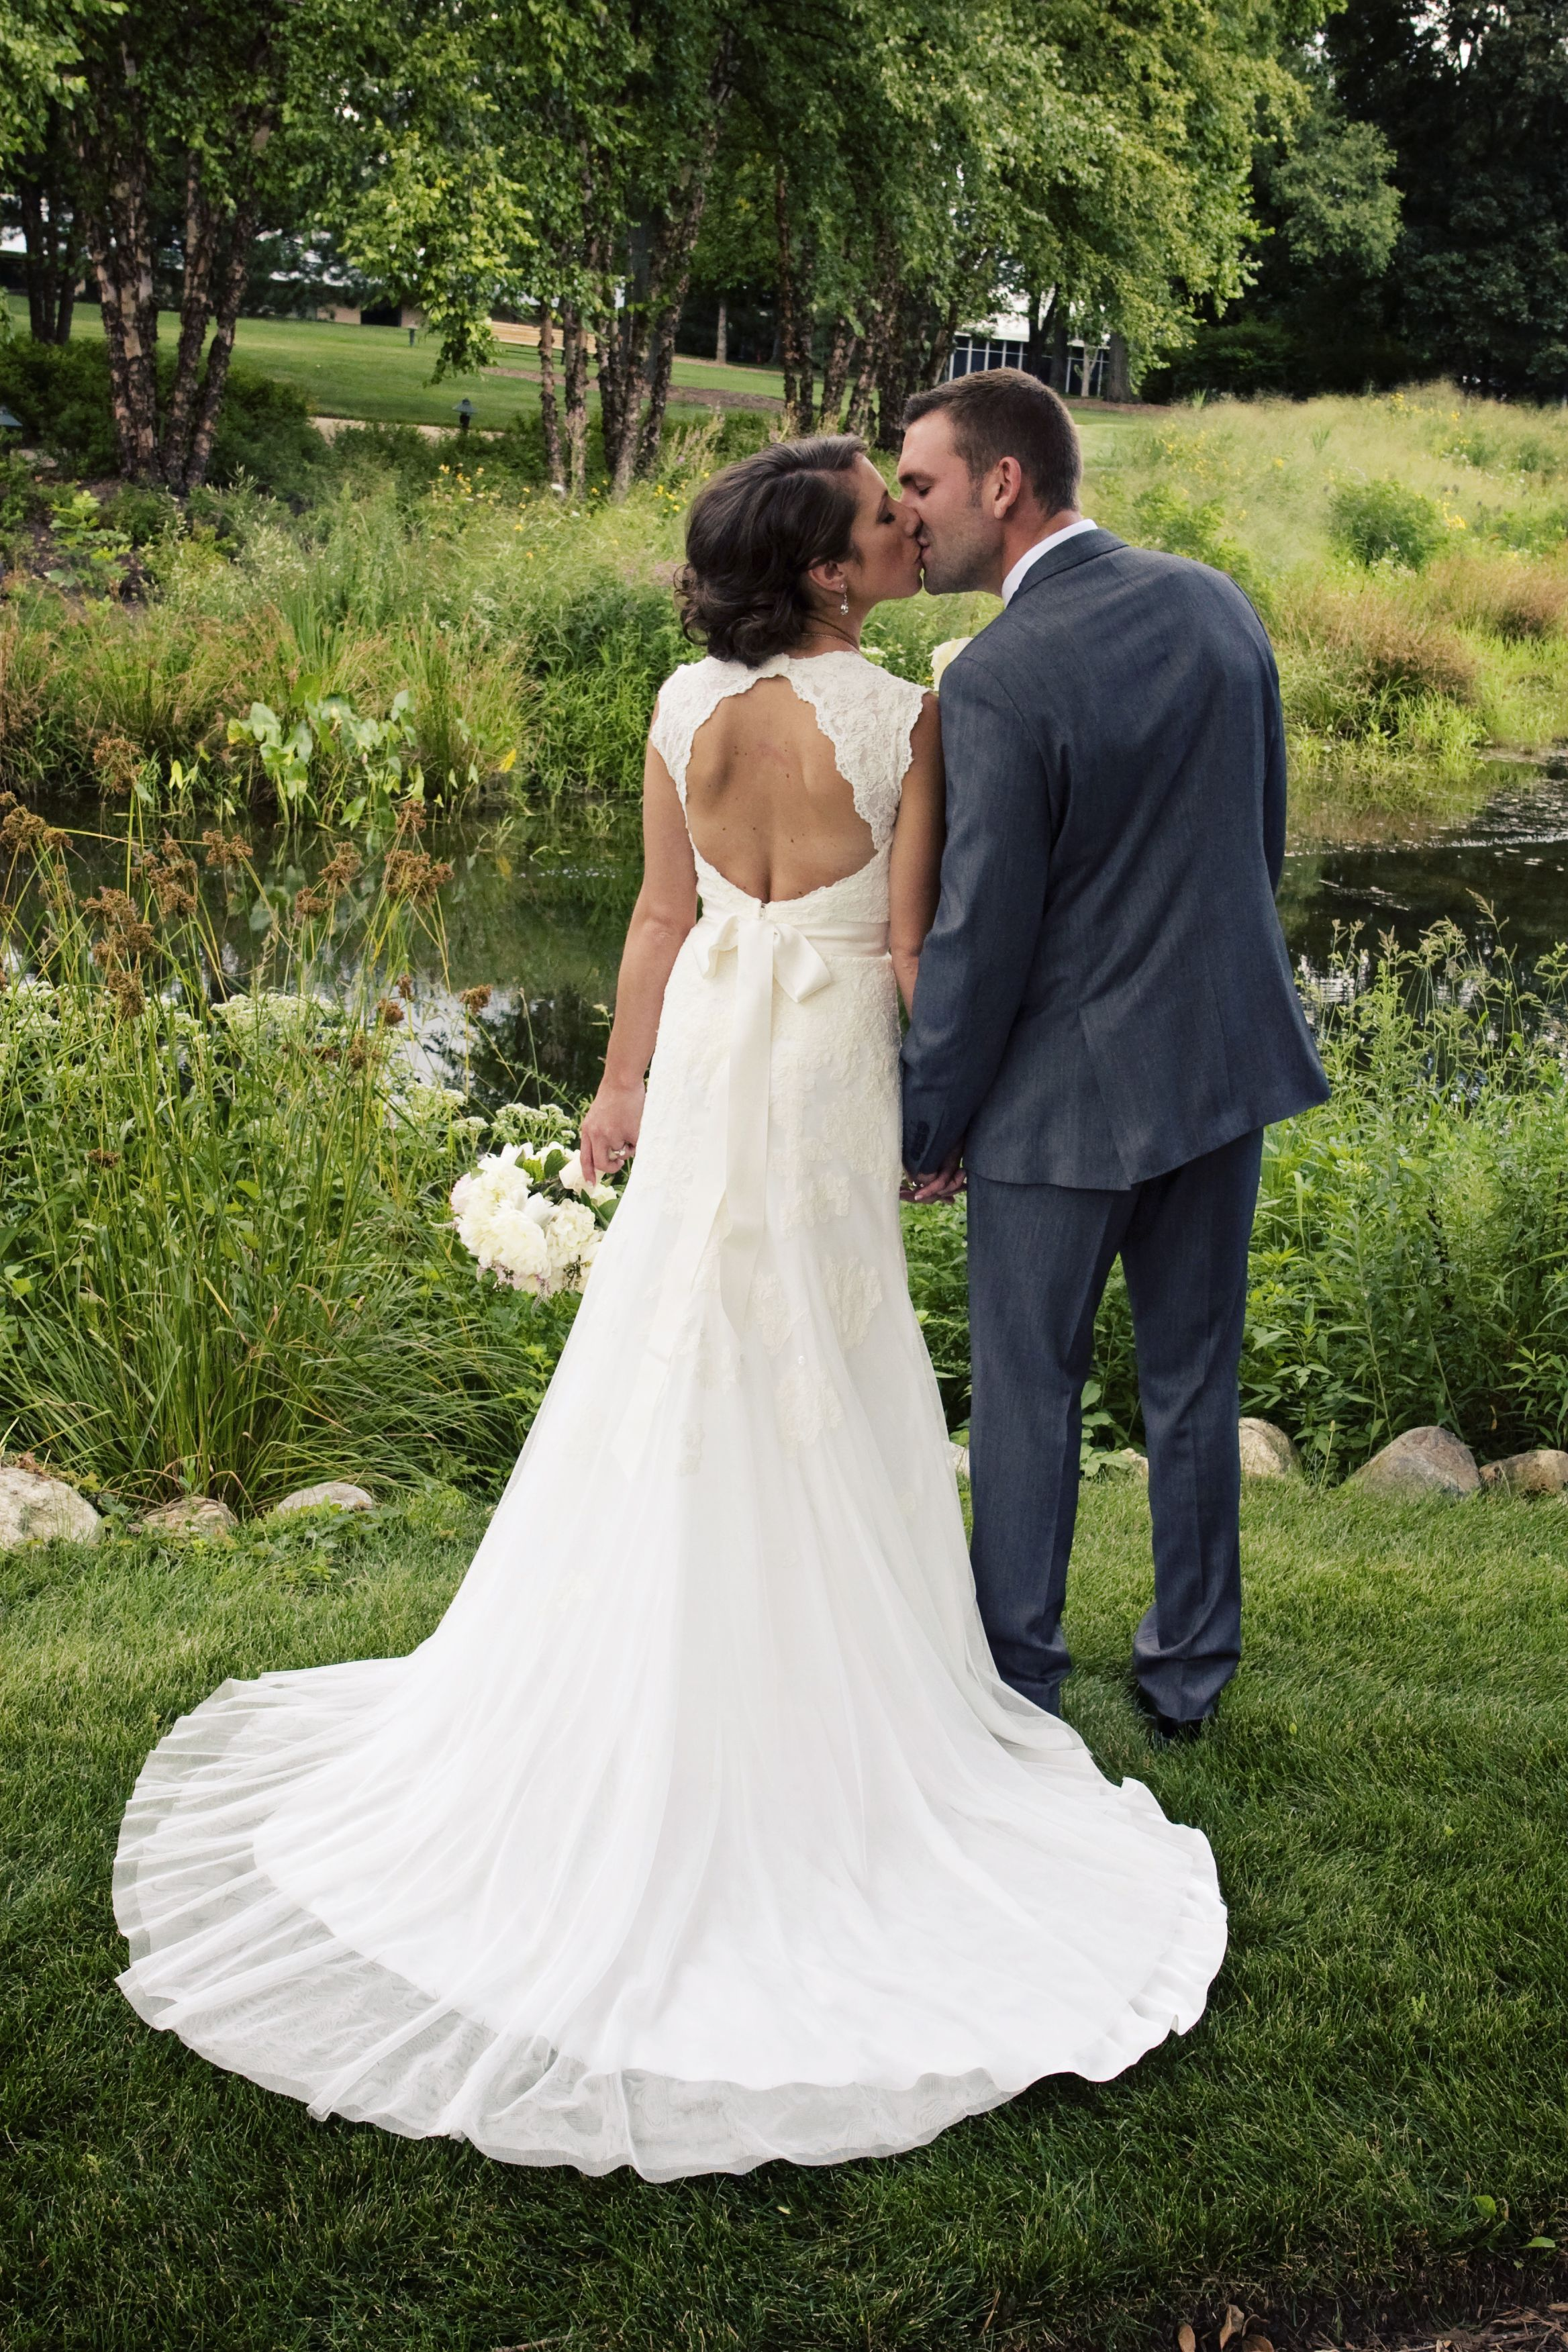 Pin By Kelly Swisher On My Wedding Wedding Dresses Beige Wedding Dress Keyhole Back Wedding Dress